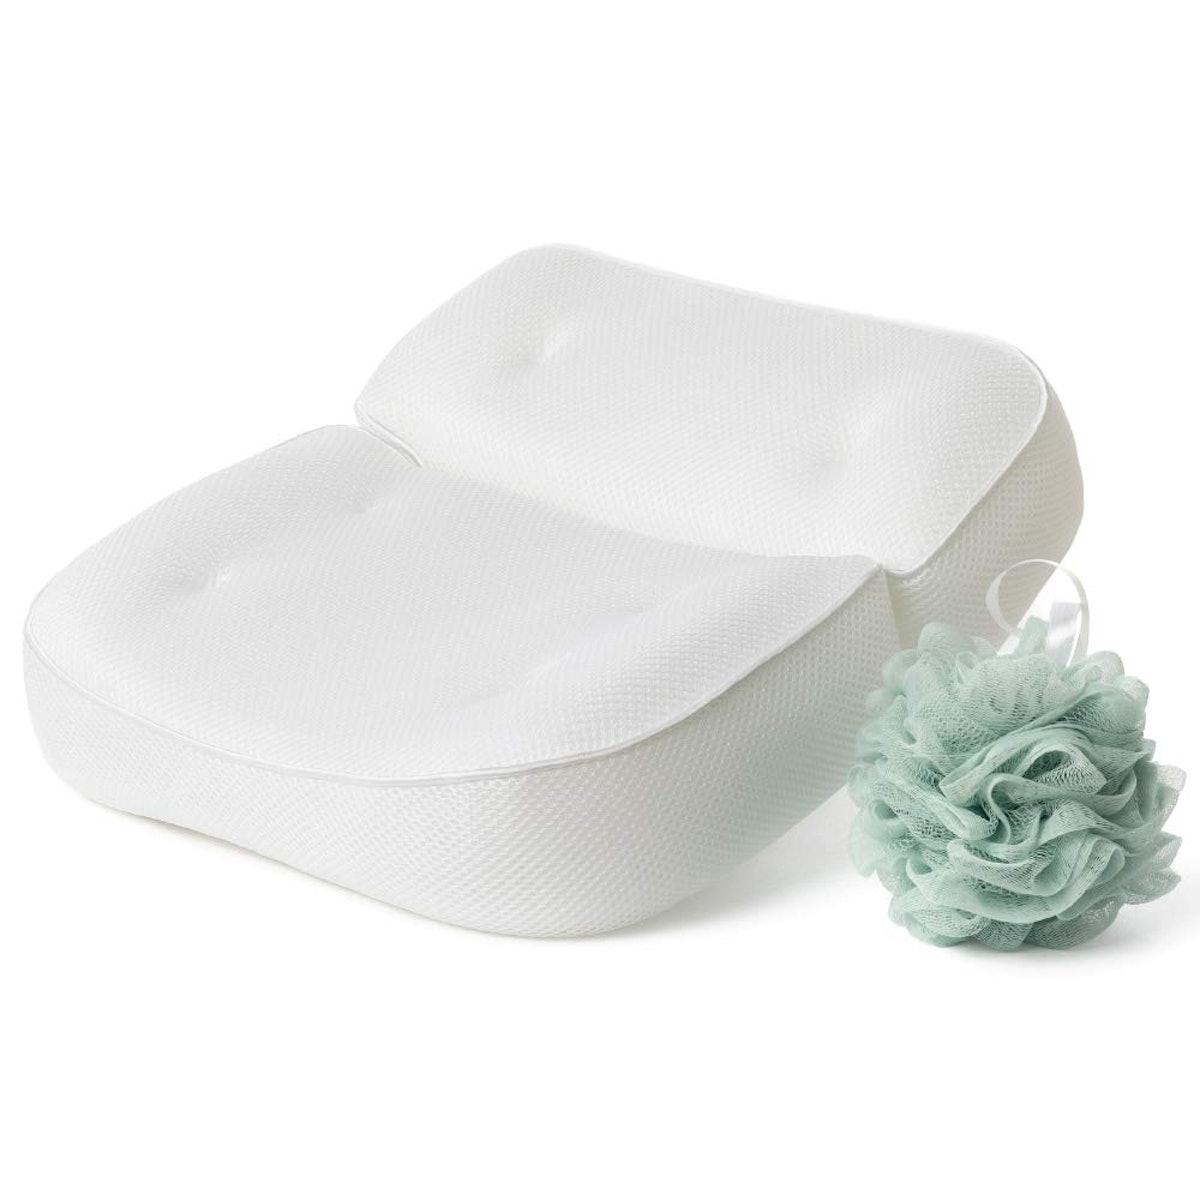 GripMAX Spa Bath Pillow